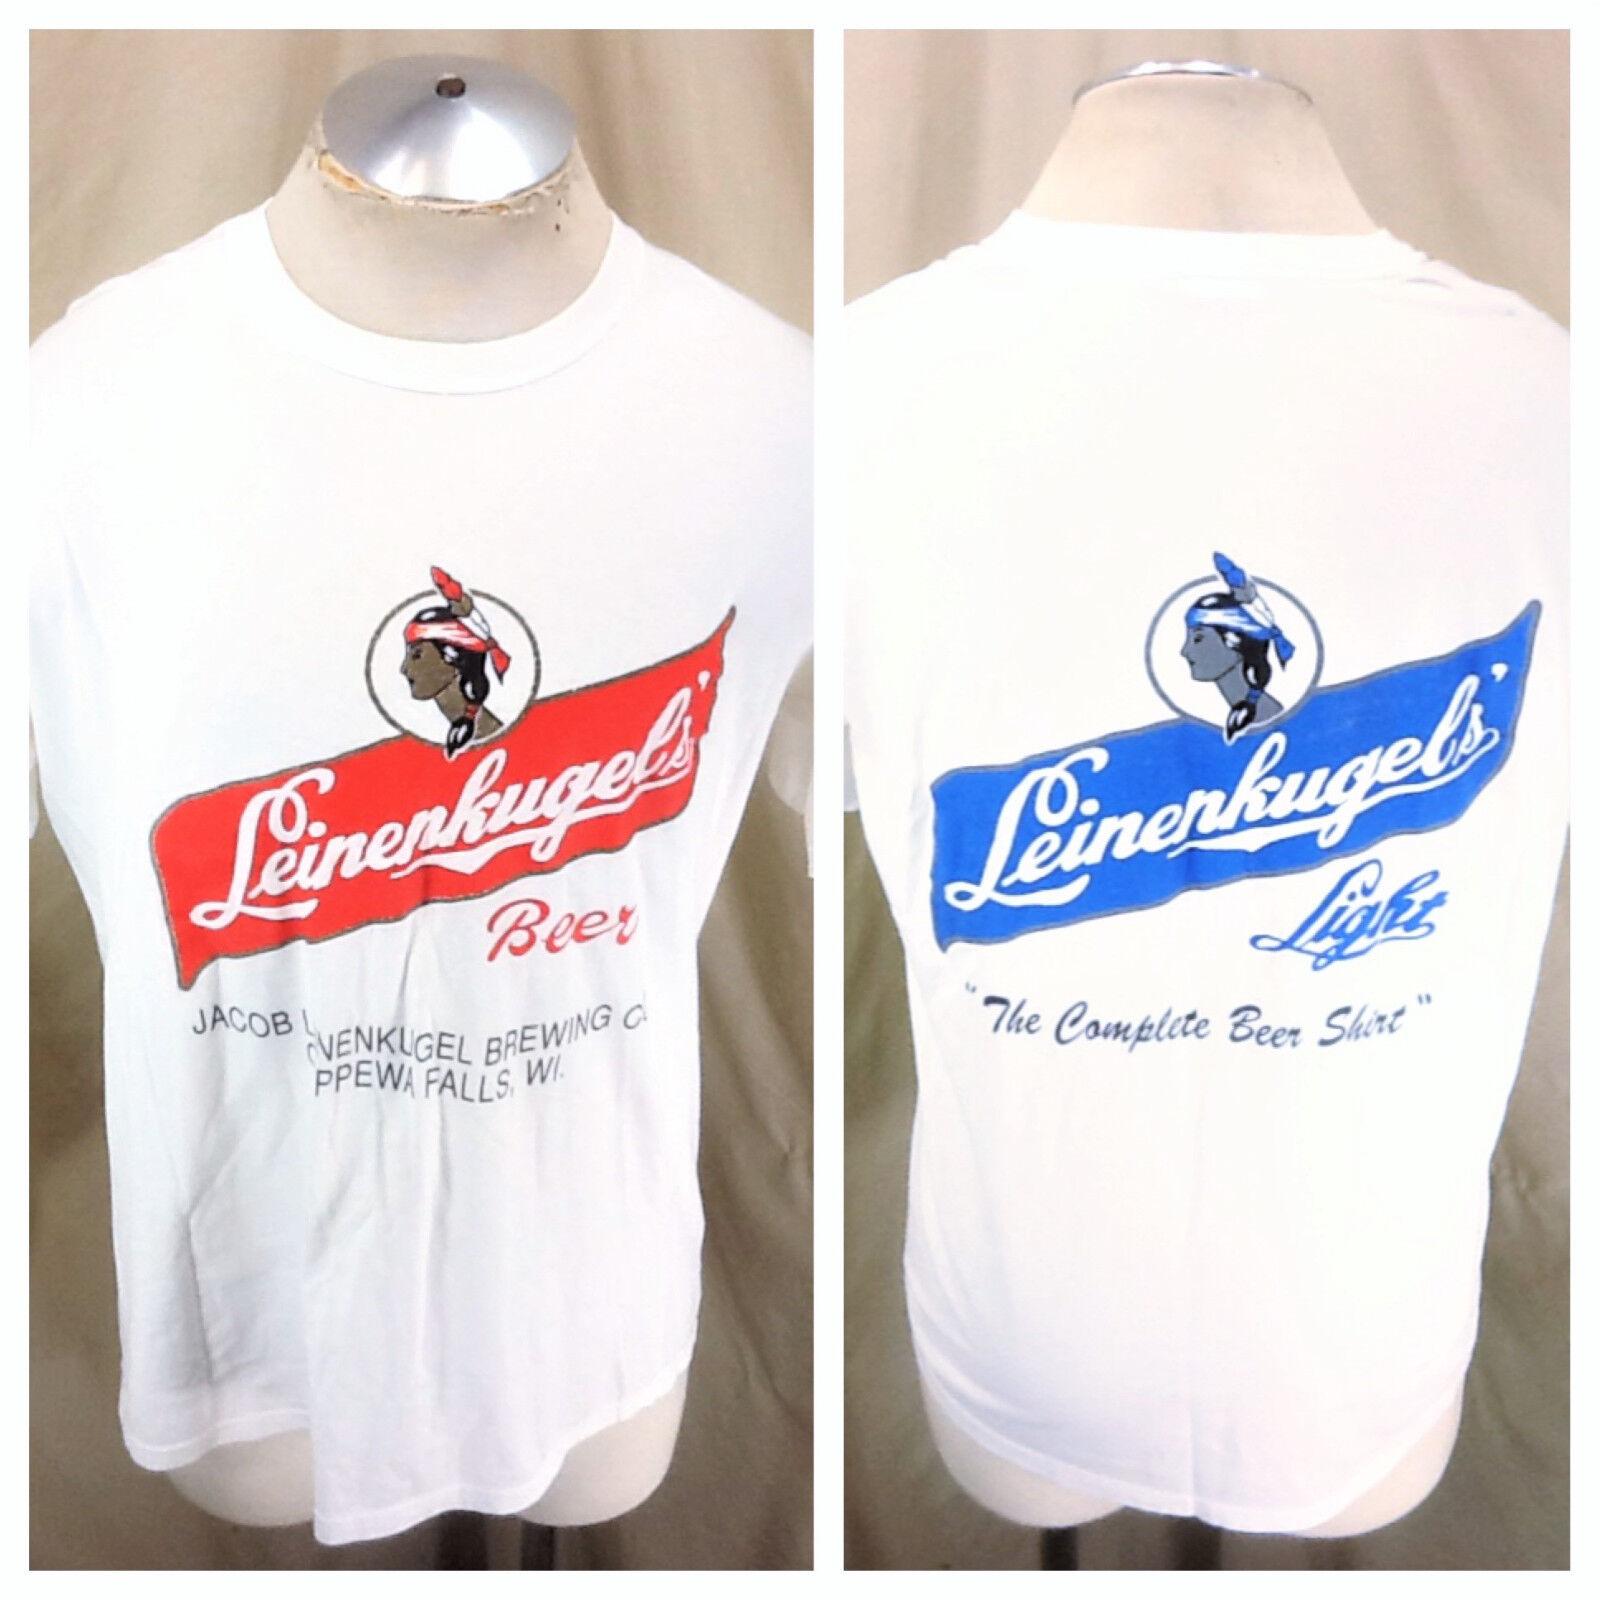 Vintage 90's Leinenkugel's Beer (XL)  Complete Beer Shirt  Retro Graphic T-Shirt